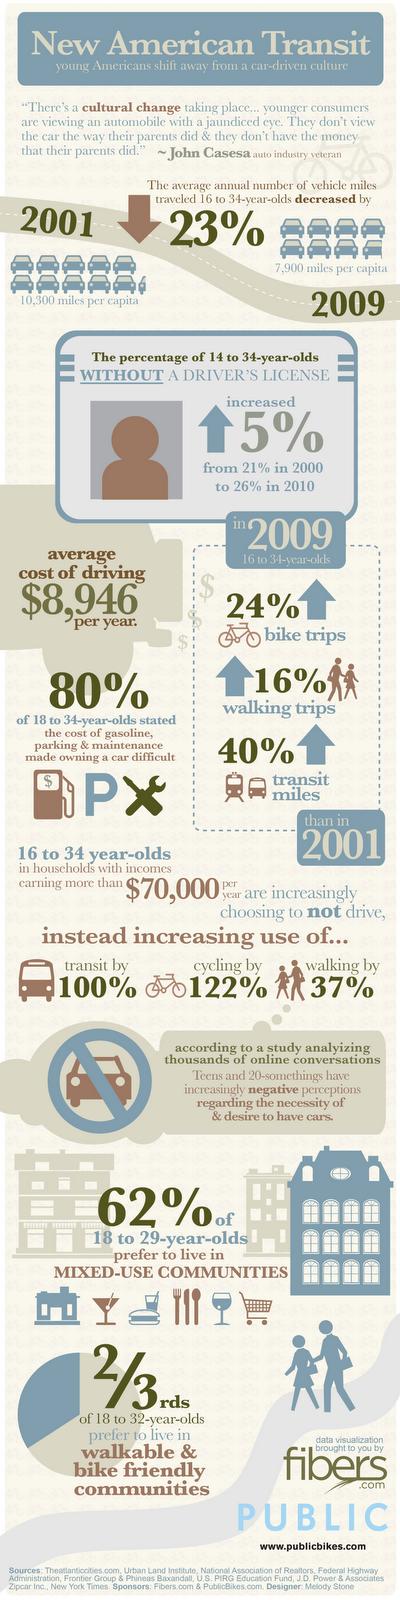 Infographic, transportation, design, cycling, walking, public transit